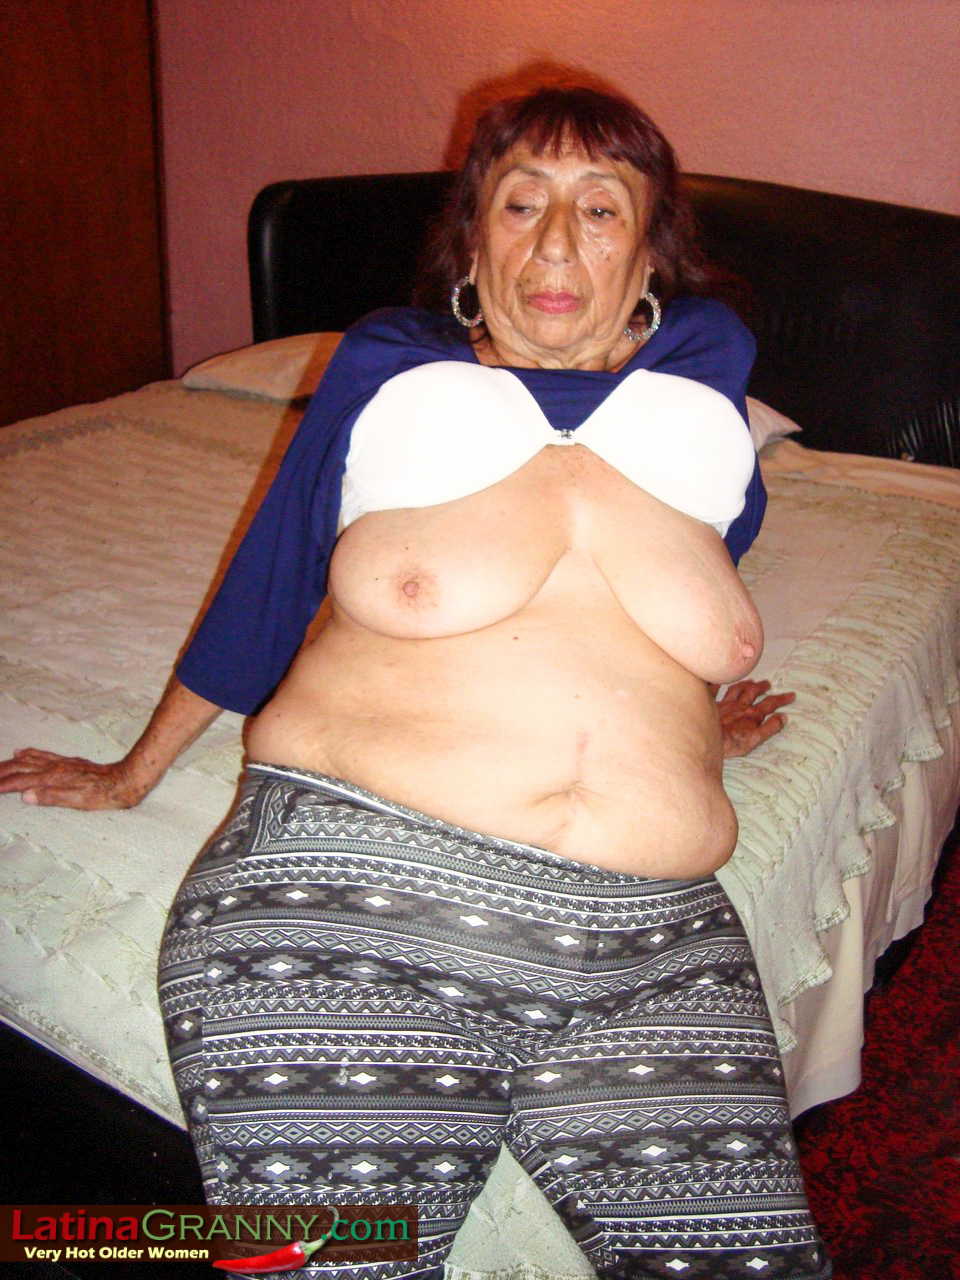 granny Amateur latina